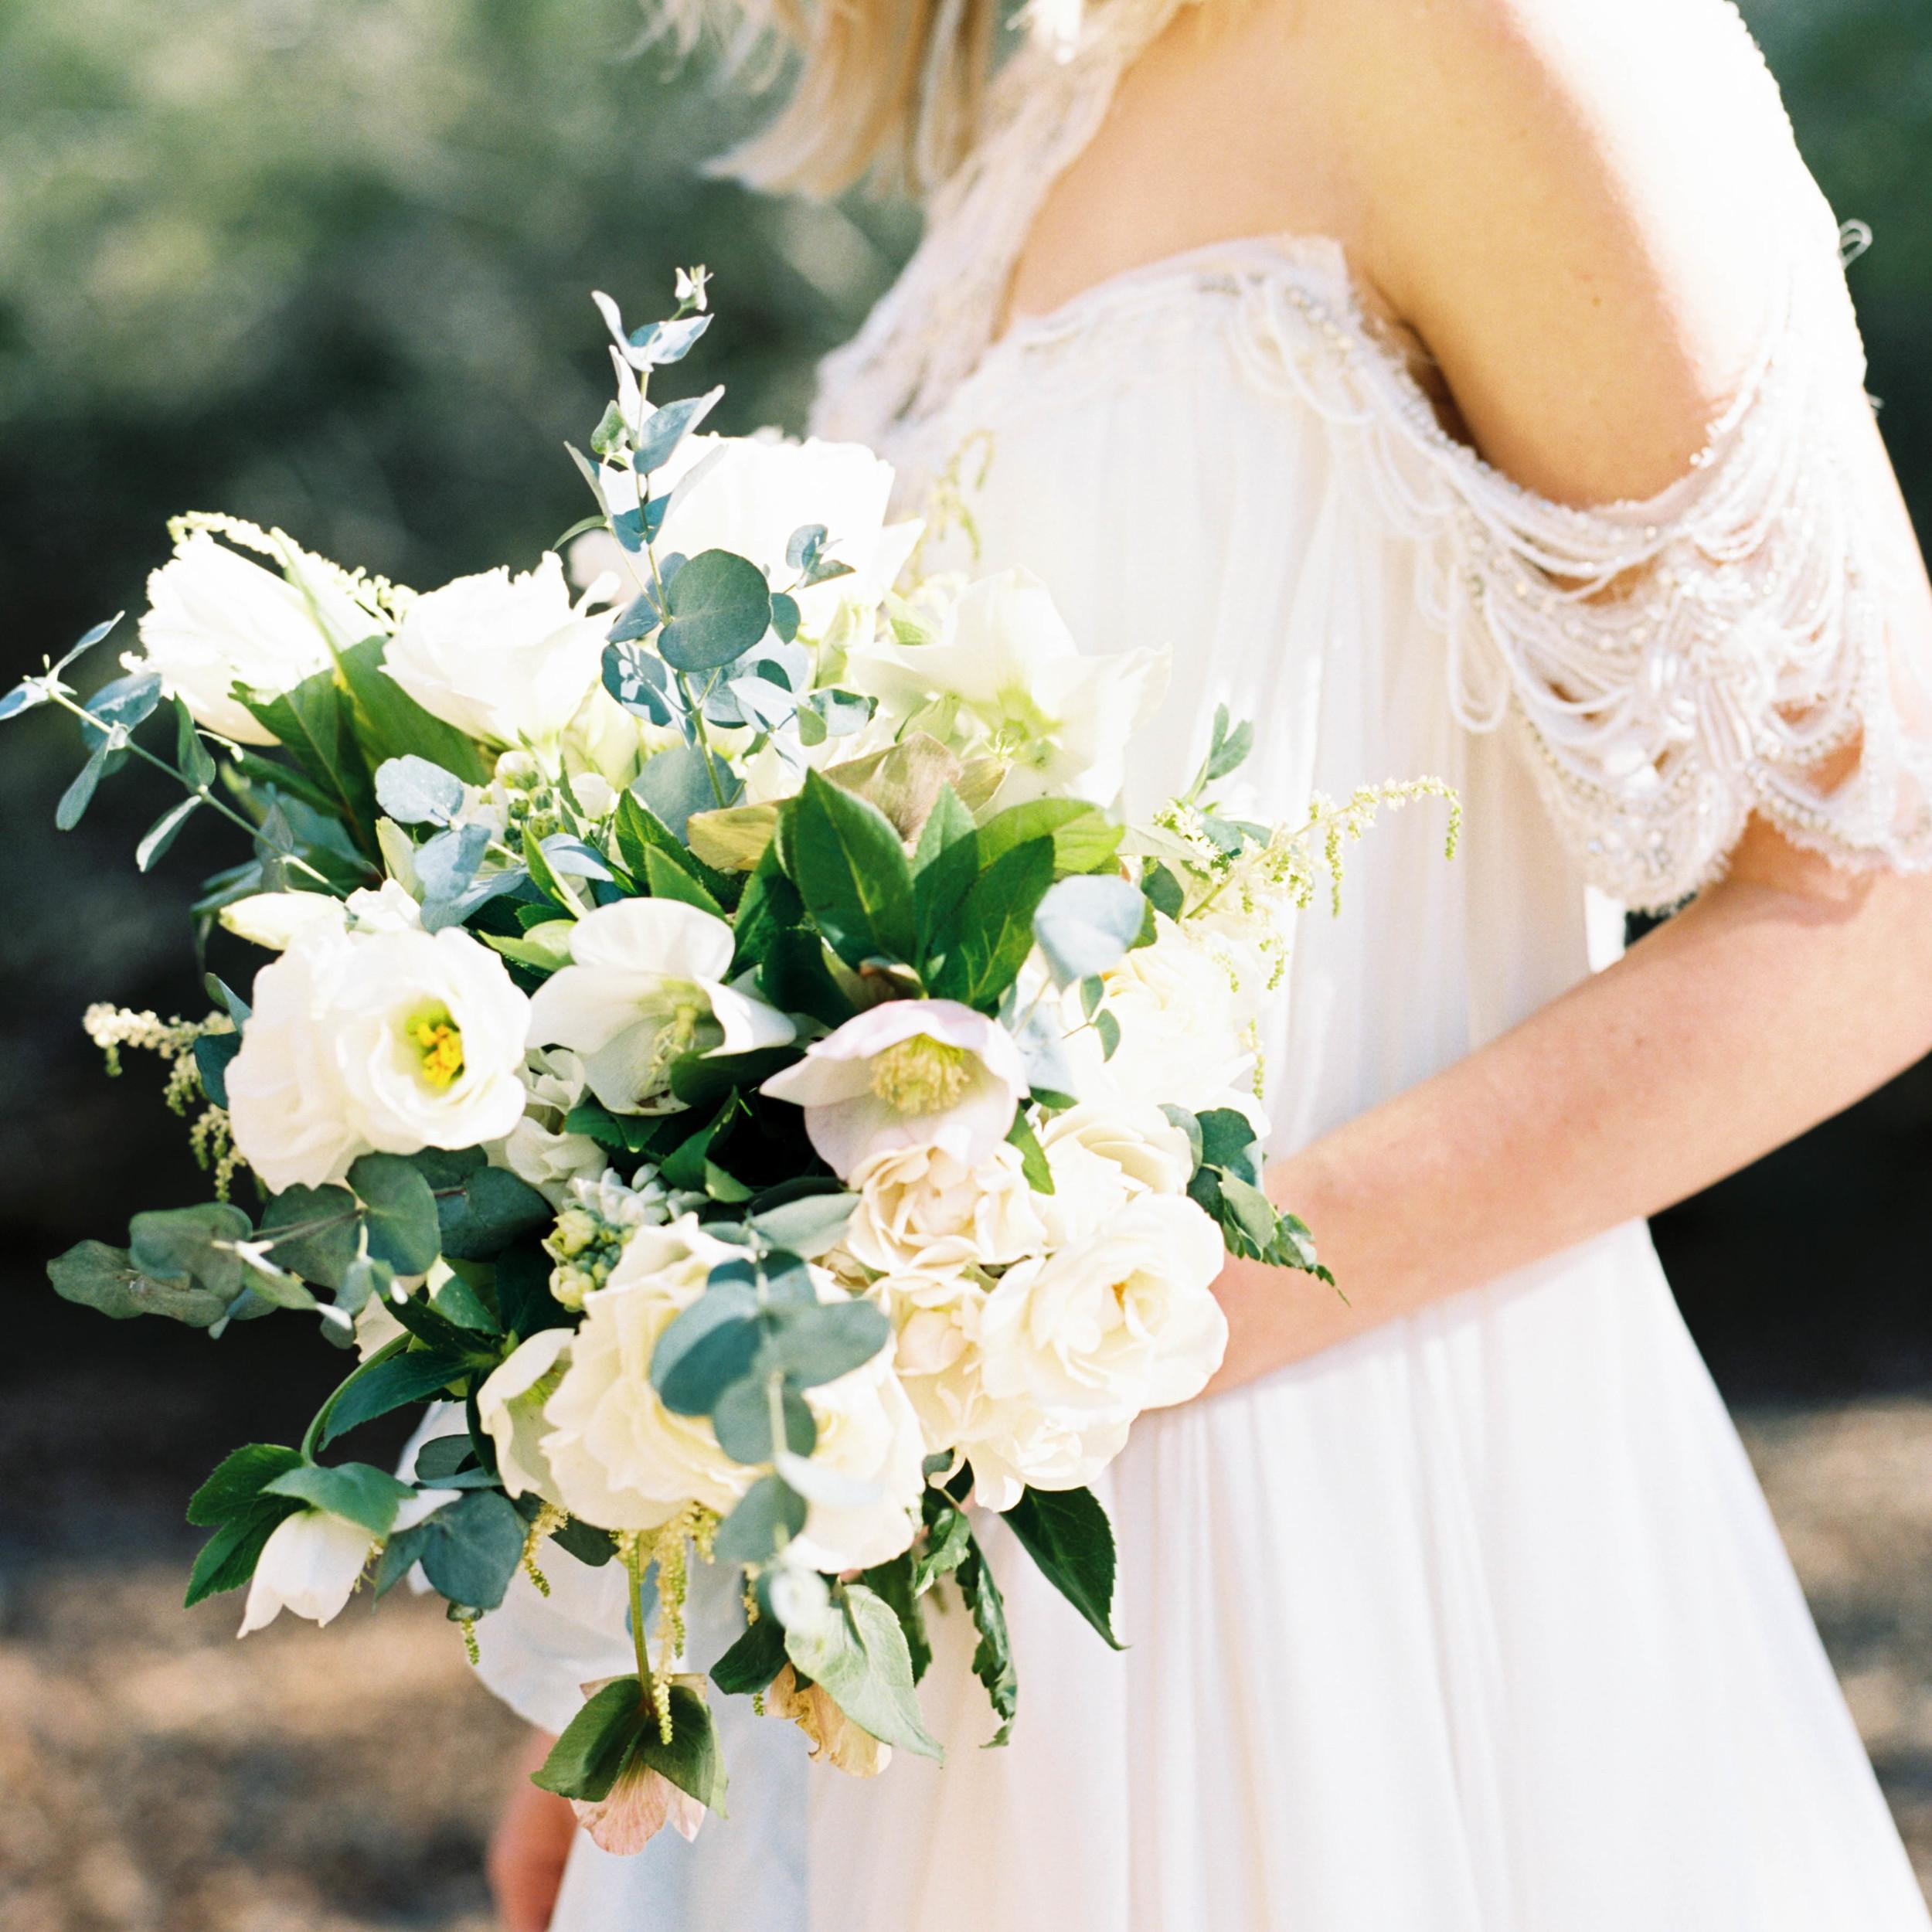 Danford-Photography-Bozeman-Montana-Arizona-Fine Art Film-Wedding-Engagement-Photographers-17.jpg